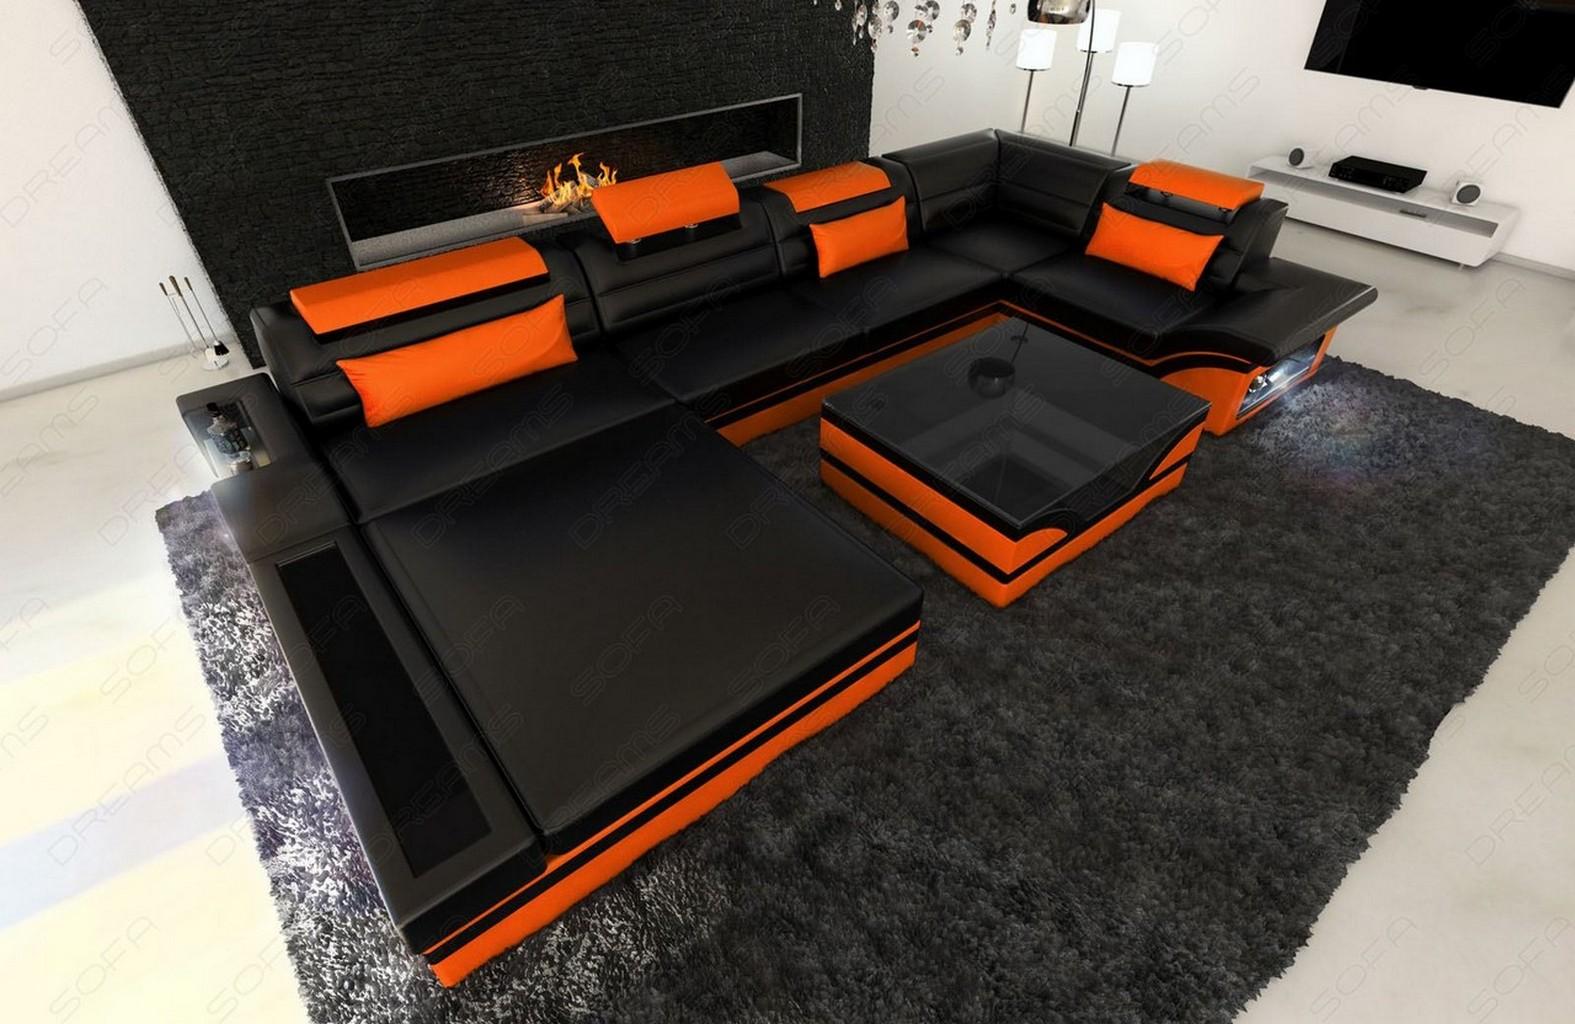 sofa wohnlandschaft mezzo led design luxussofa schwarz orange ebay. Black Bedroom Furniture Sets. Home Design Ideas